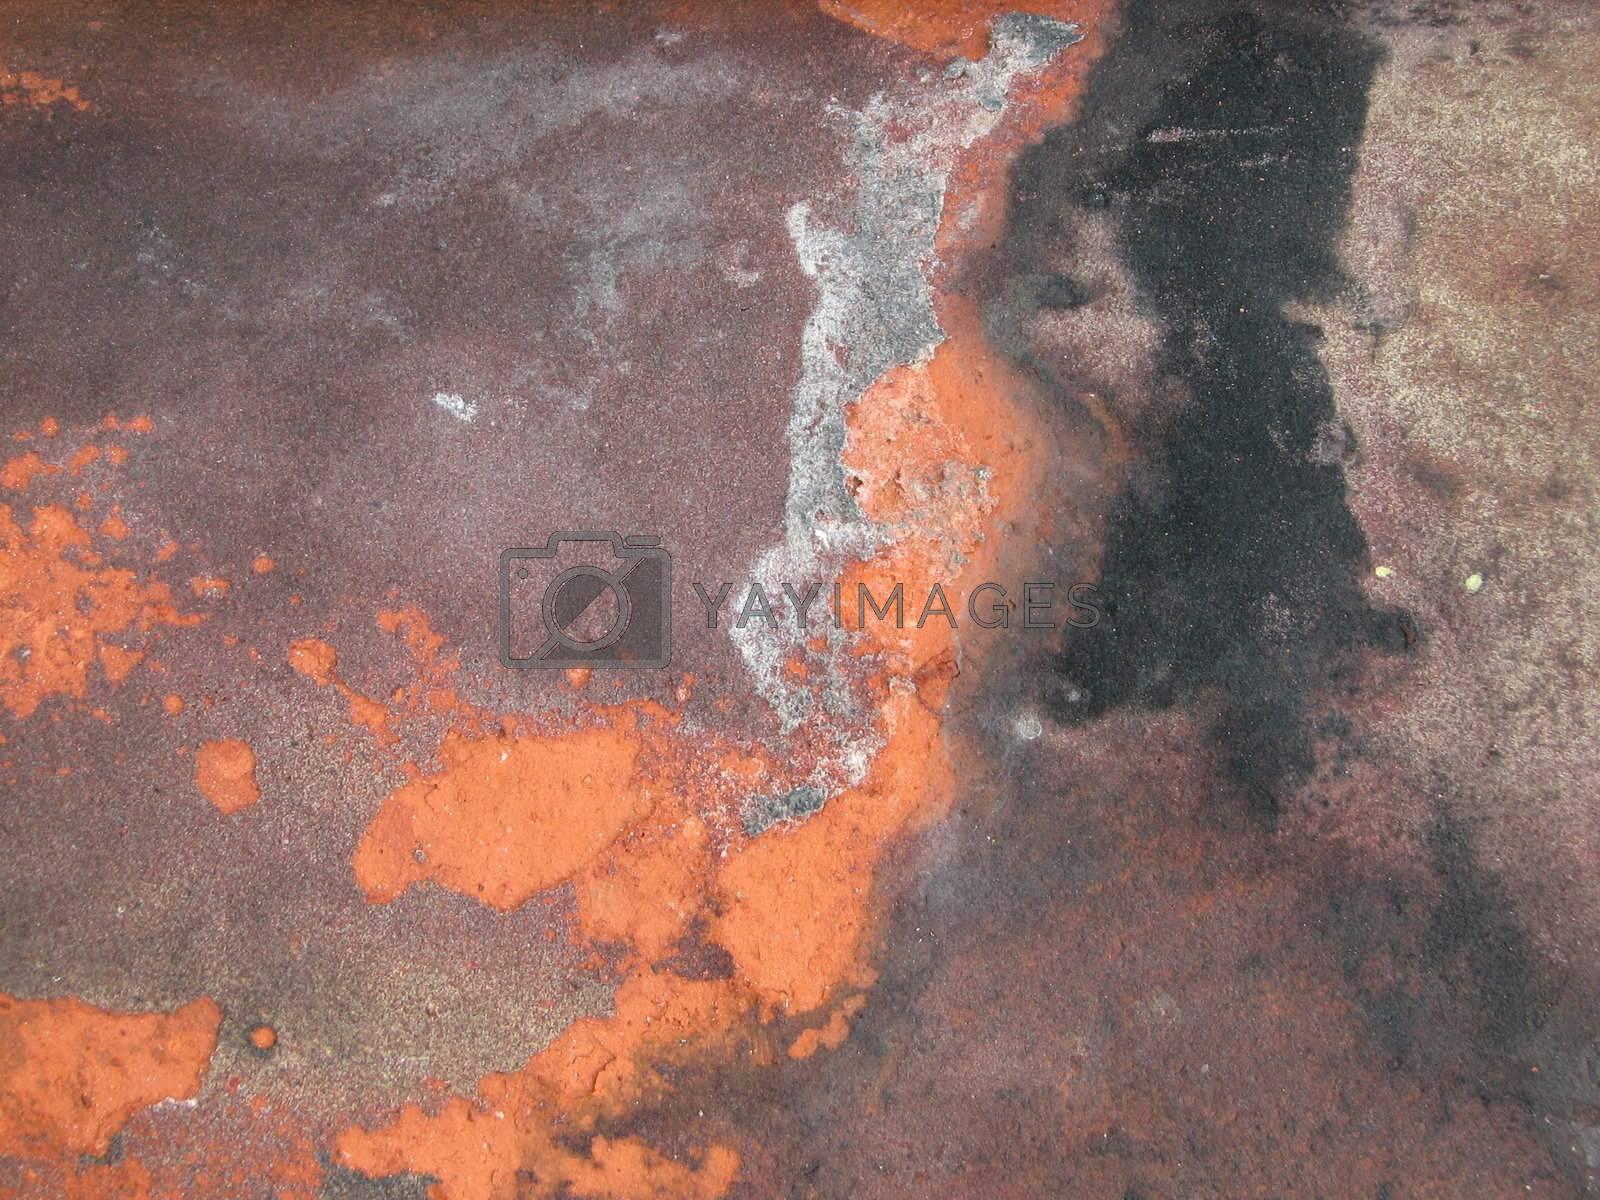 Stone Background, close-up of a brick